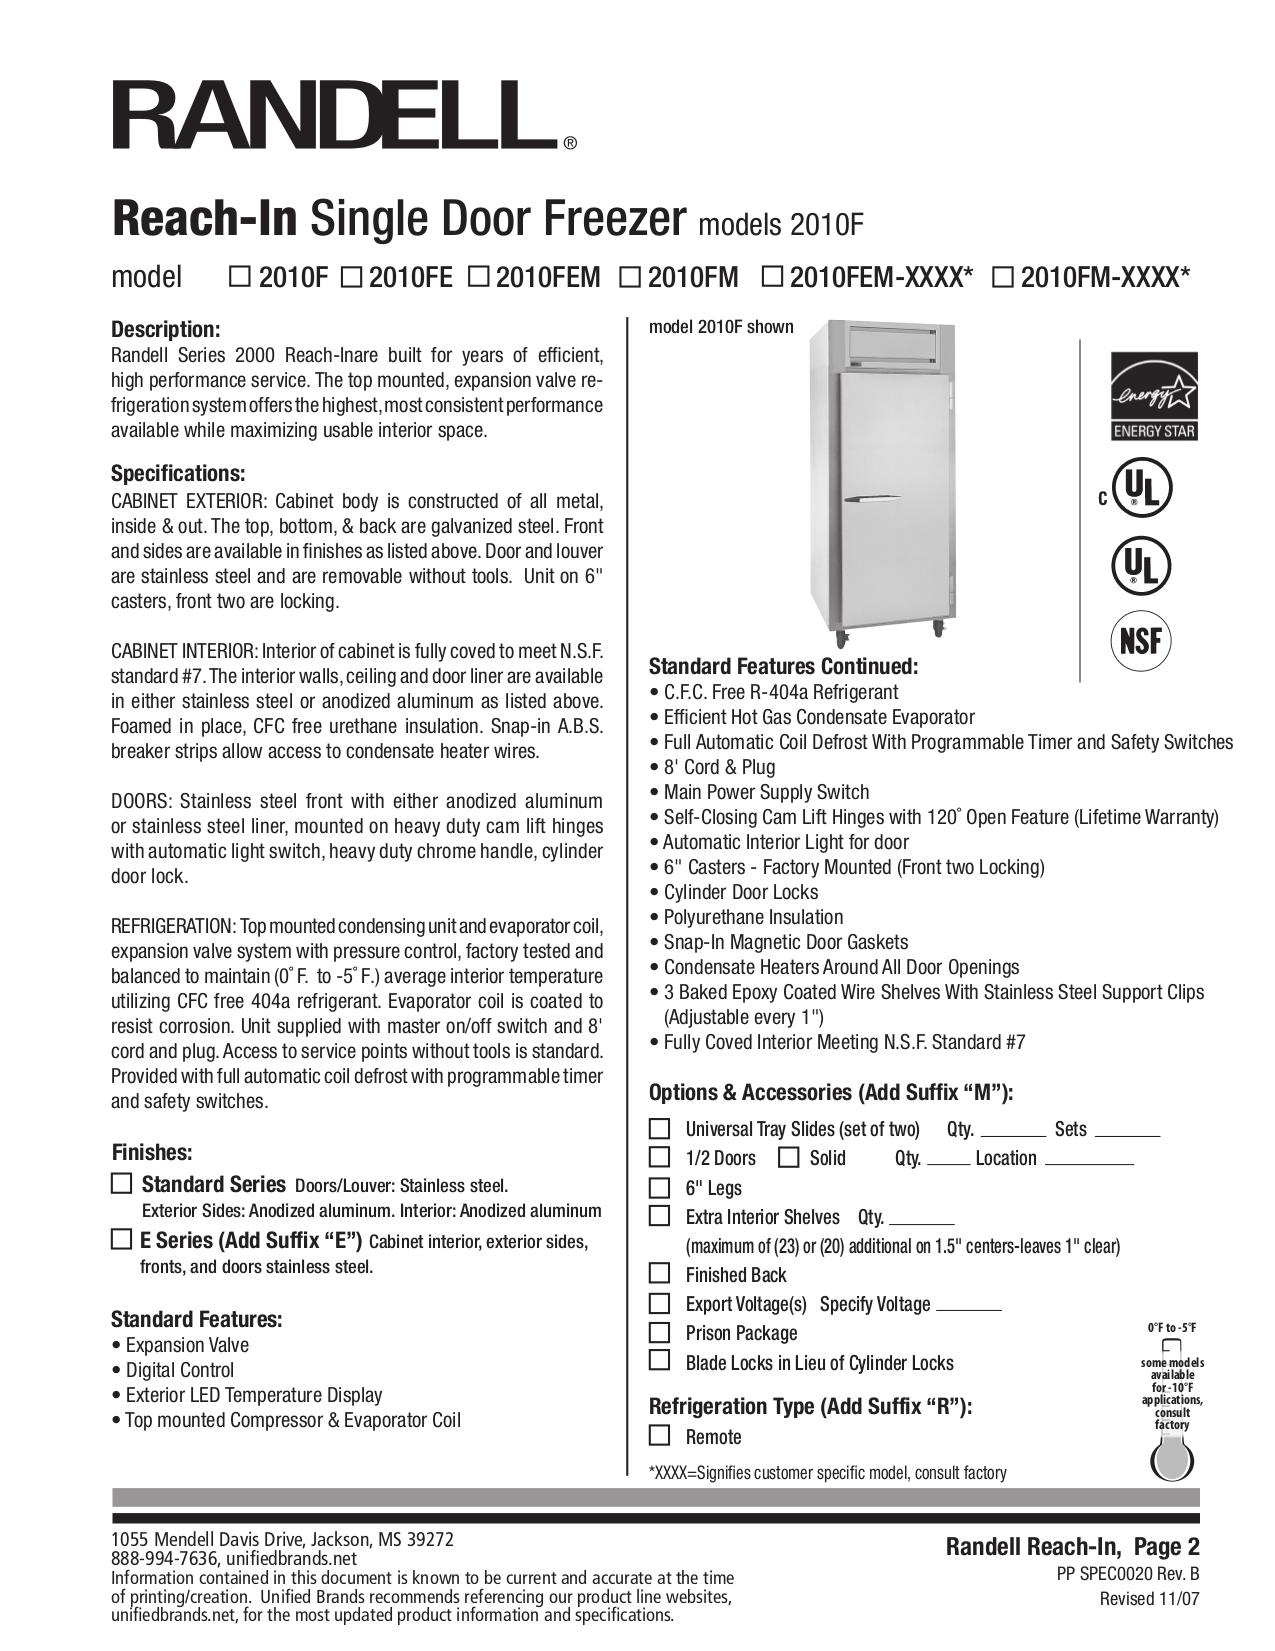 Outstanding migali freezer wiring diagram contemporary best image migali freezer wiring diagram wiring data cheapraybanclubmaster Gallery